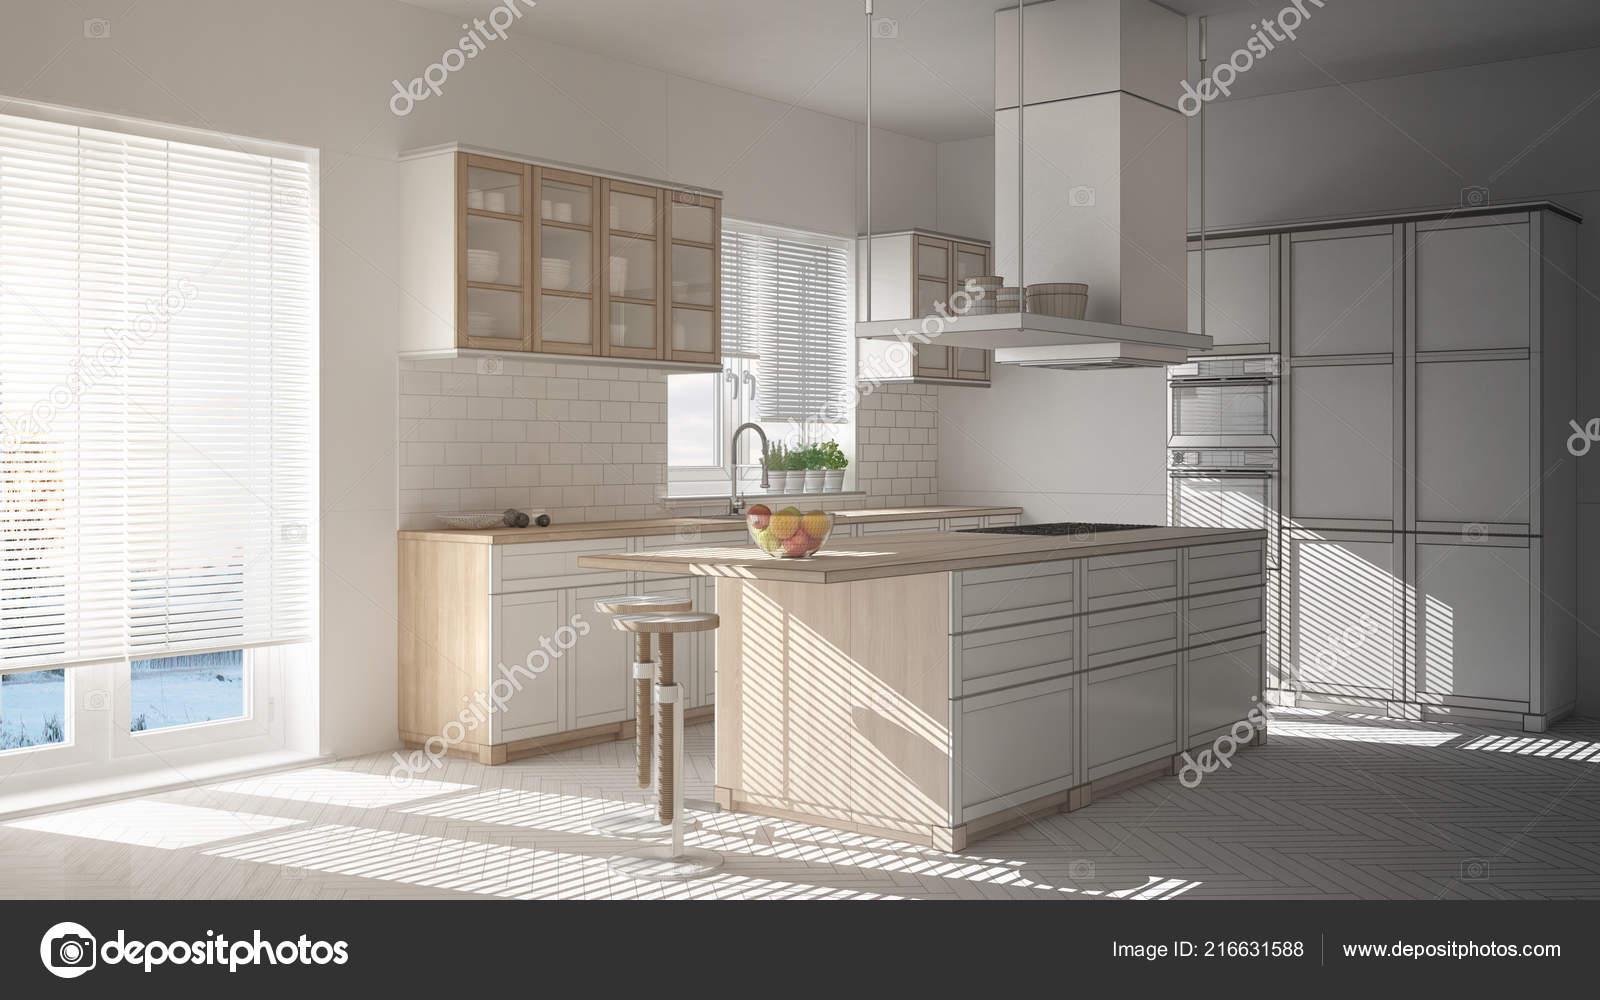 islands for the kitchen table chairs 未完成的项目的现代木白色厨房与岛屿凳子和窗户镶木人字地板 图库照片 未完成的项目的现代木白色厨房与岛屿凳子和窗户镶木